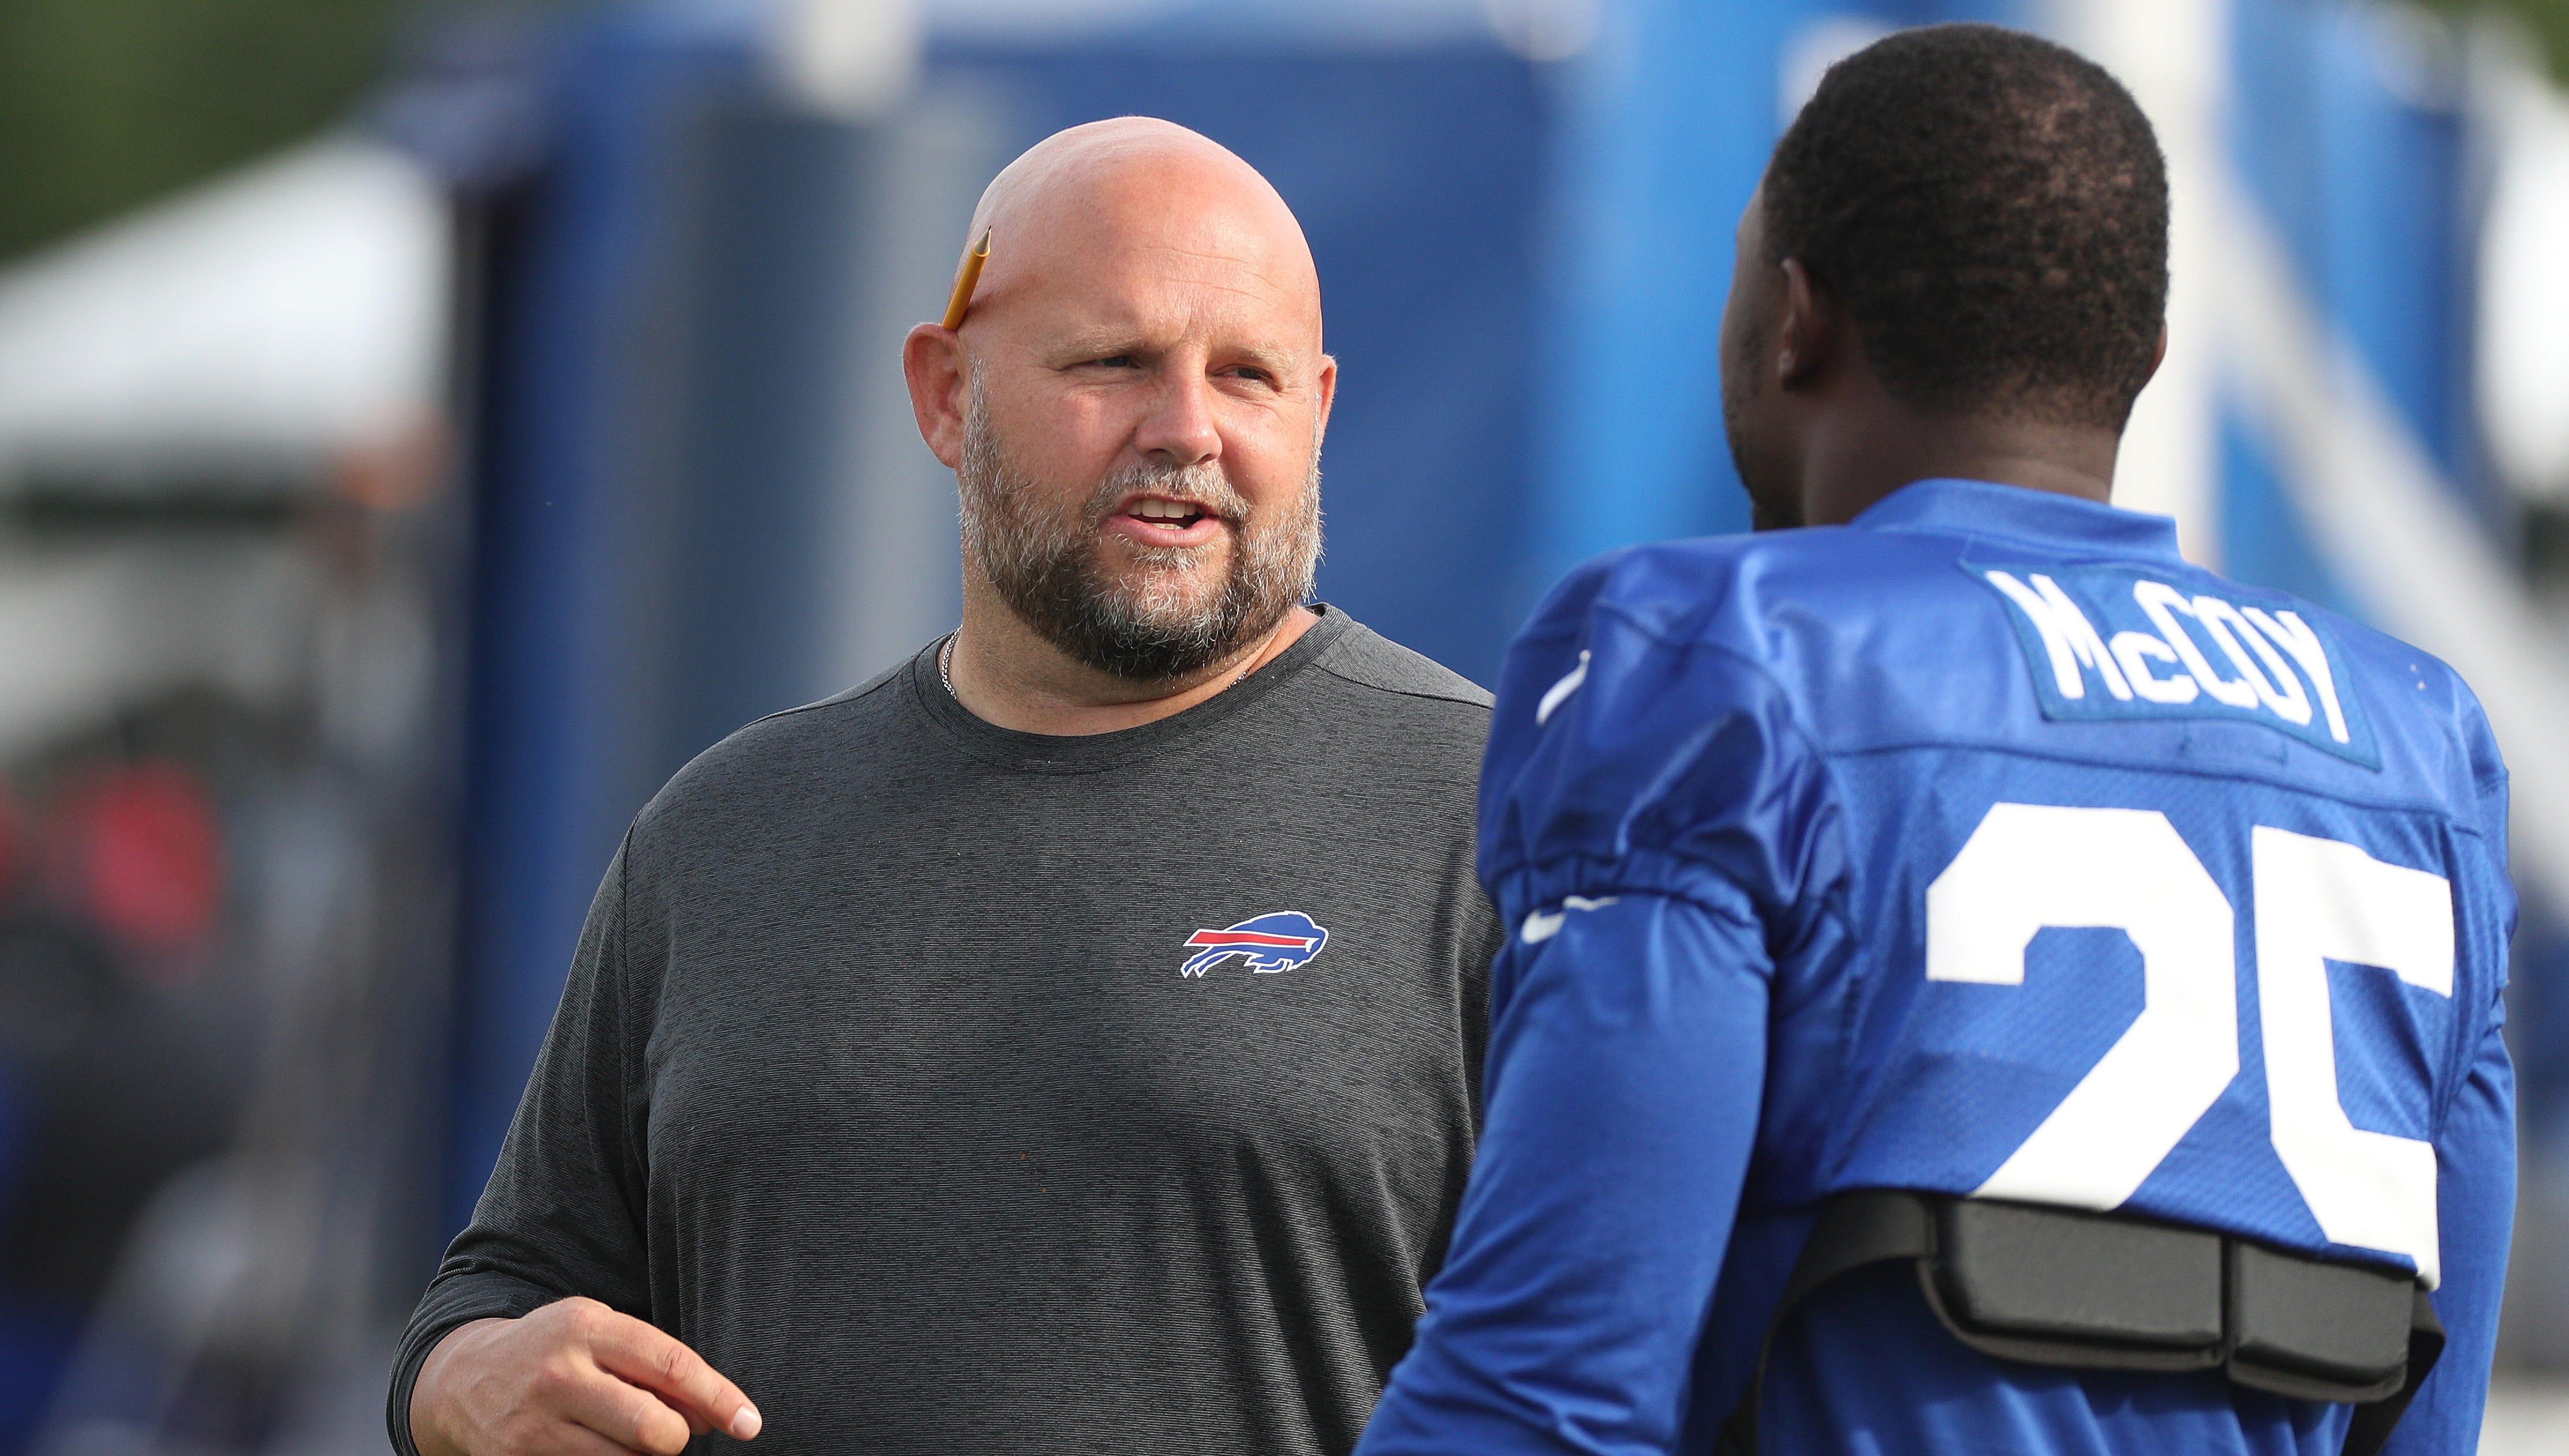 Buffalo Bills quarterback competition: Coaches continue to stick to plan